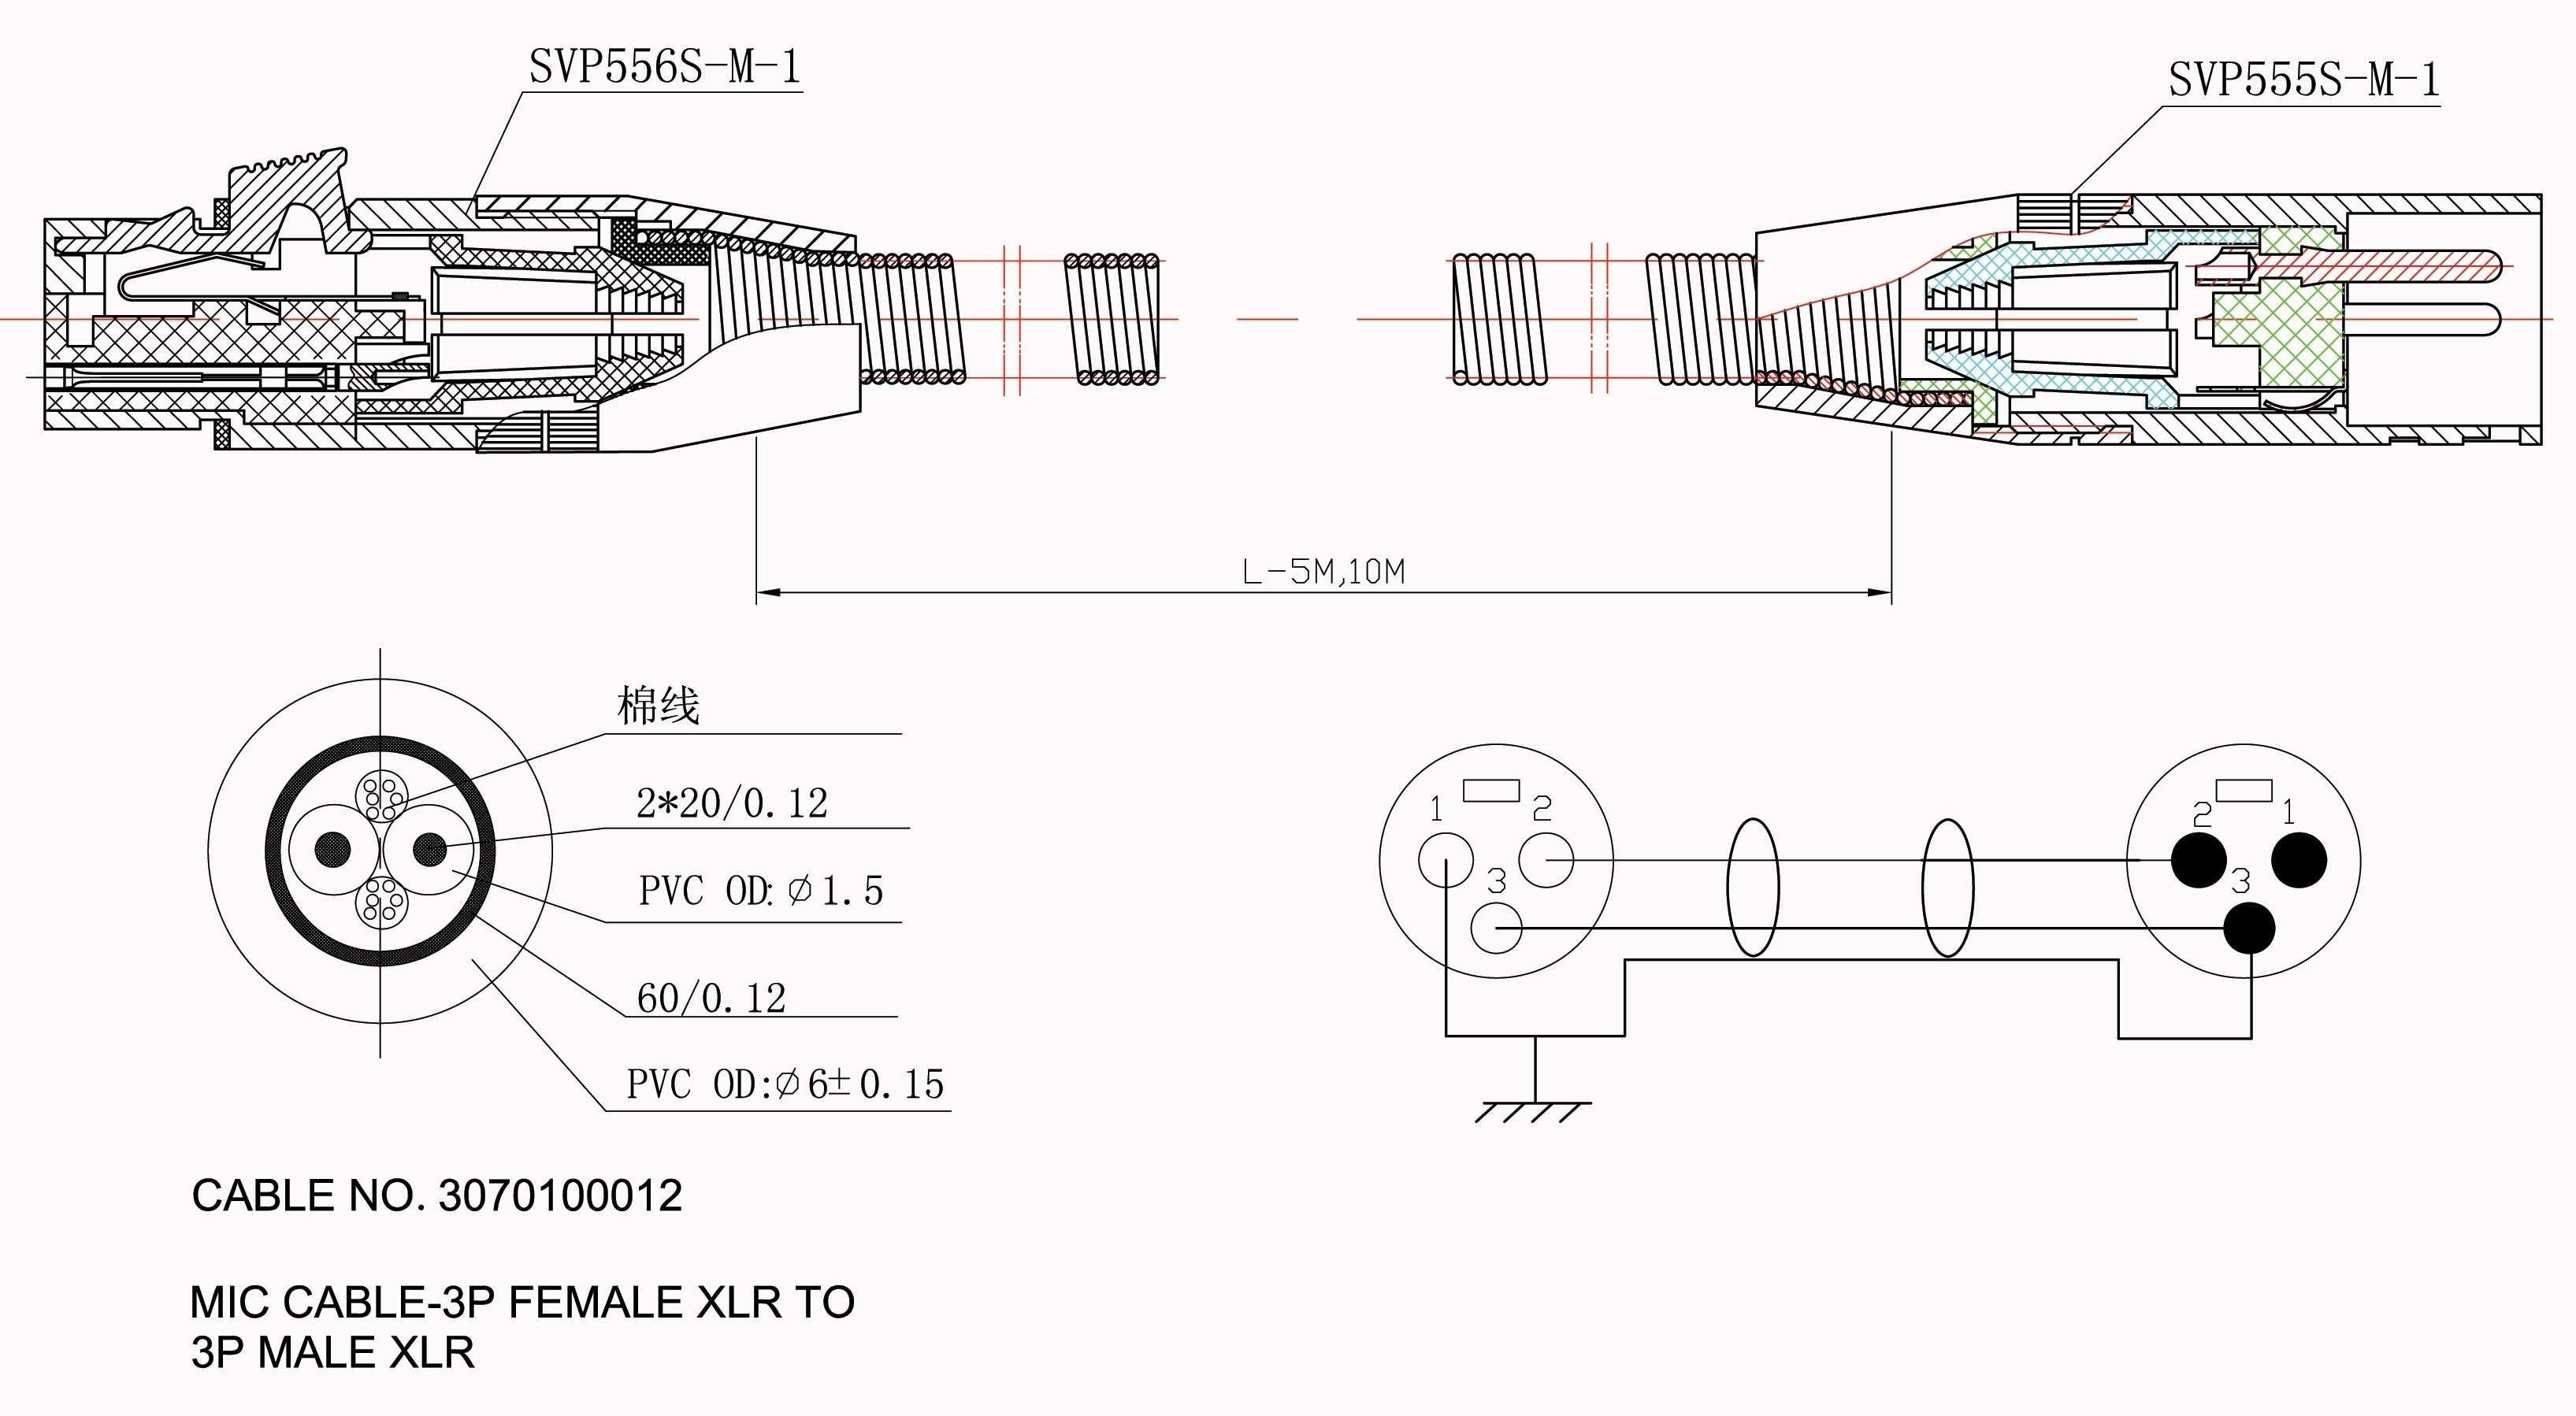 2000 Infiniti I30 Engine Diagram 2000 Audi A8 Wiring Diagram Experts Wiring Diagram • Of 2000 Infiniti I30 Engine Diagram